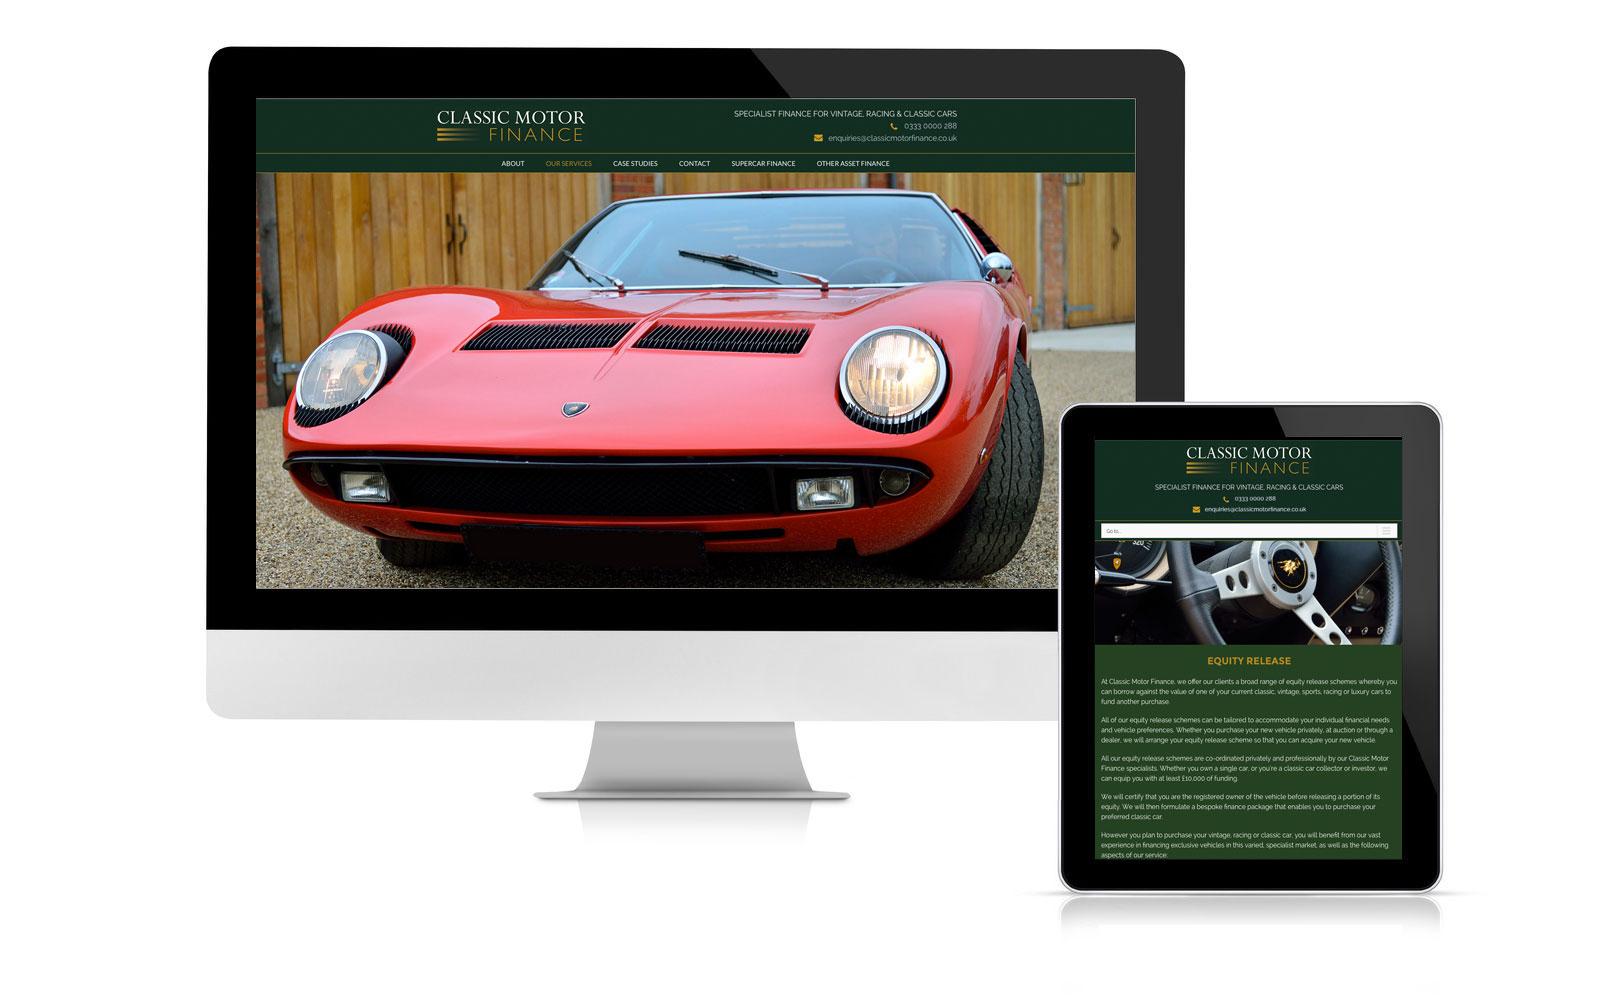 Classic Motor Finance website design